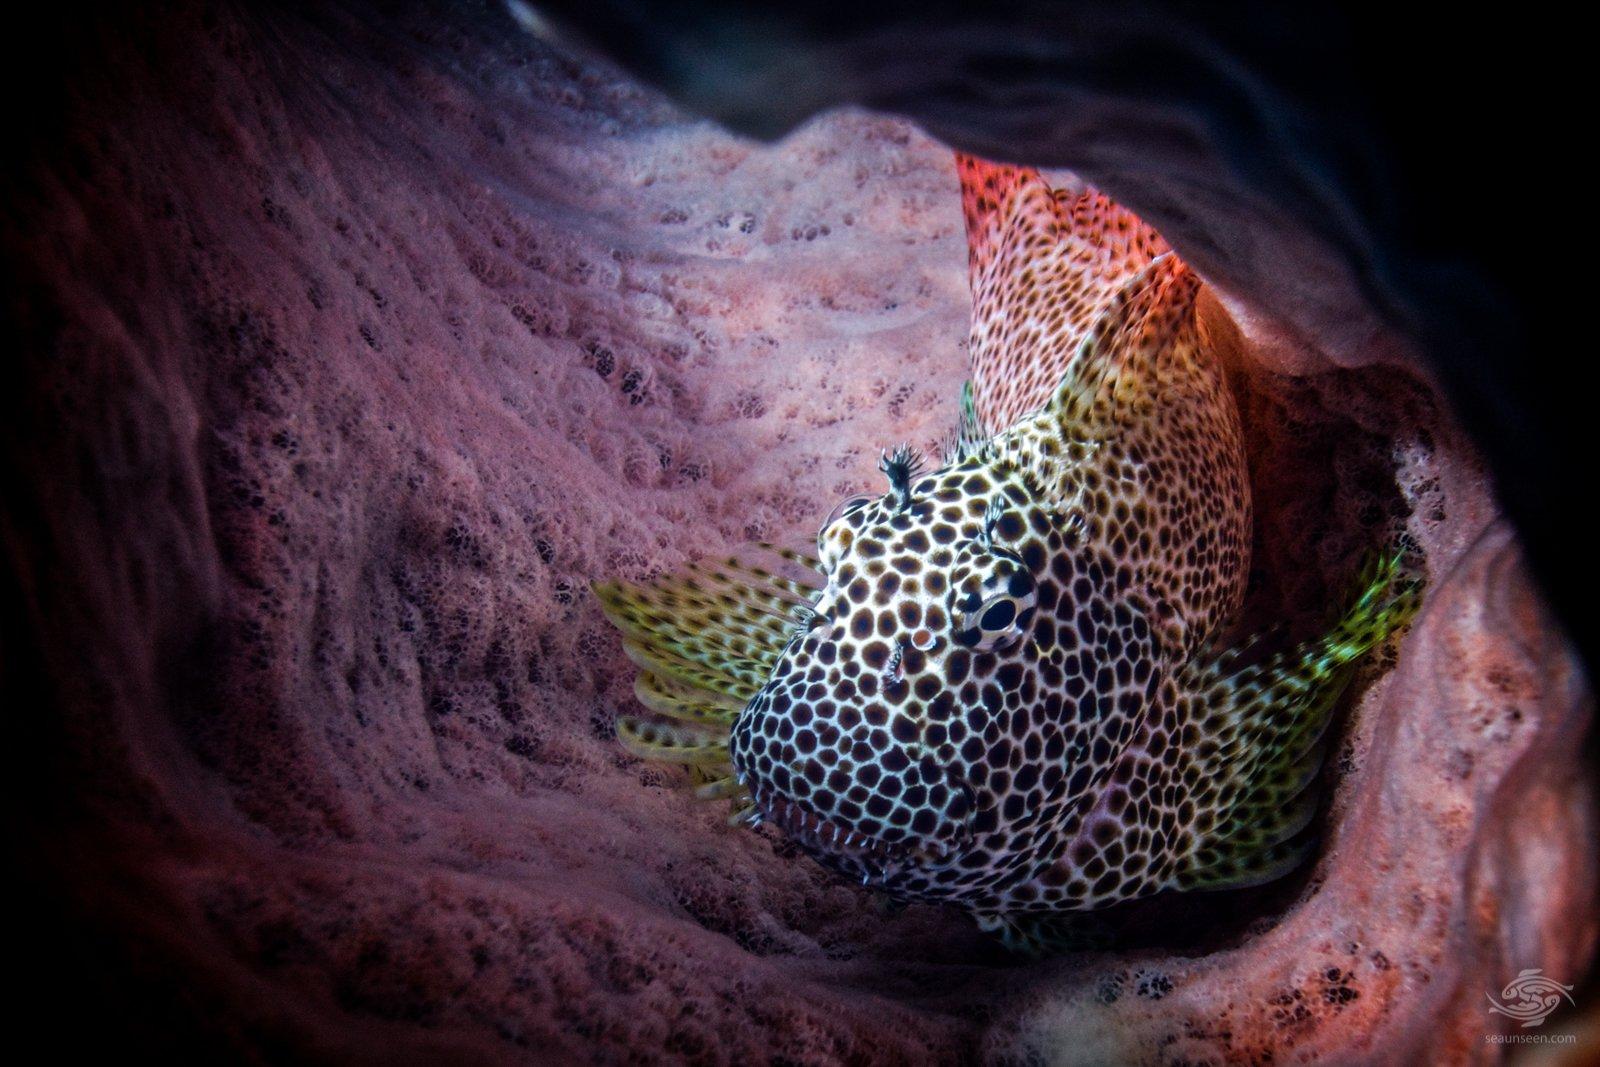 Leopard blenny (Exallias brevis)